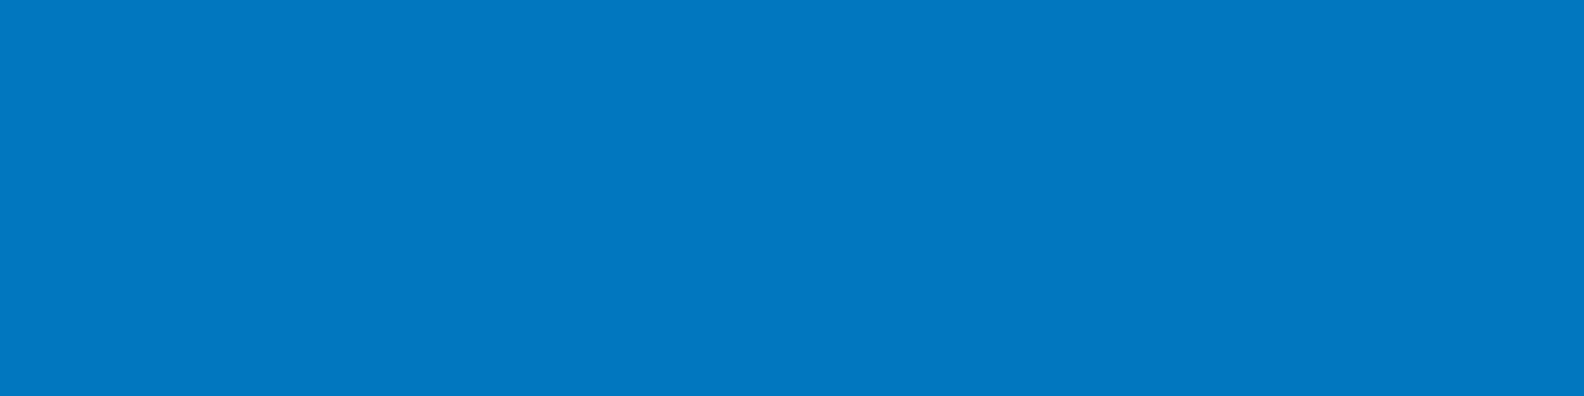 1584x396 Ocean Boat Blue Solid Color Background